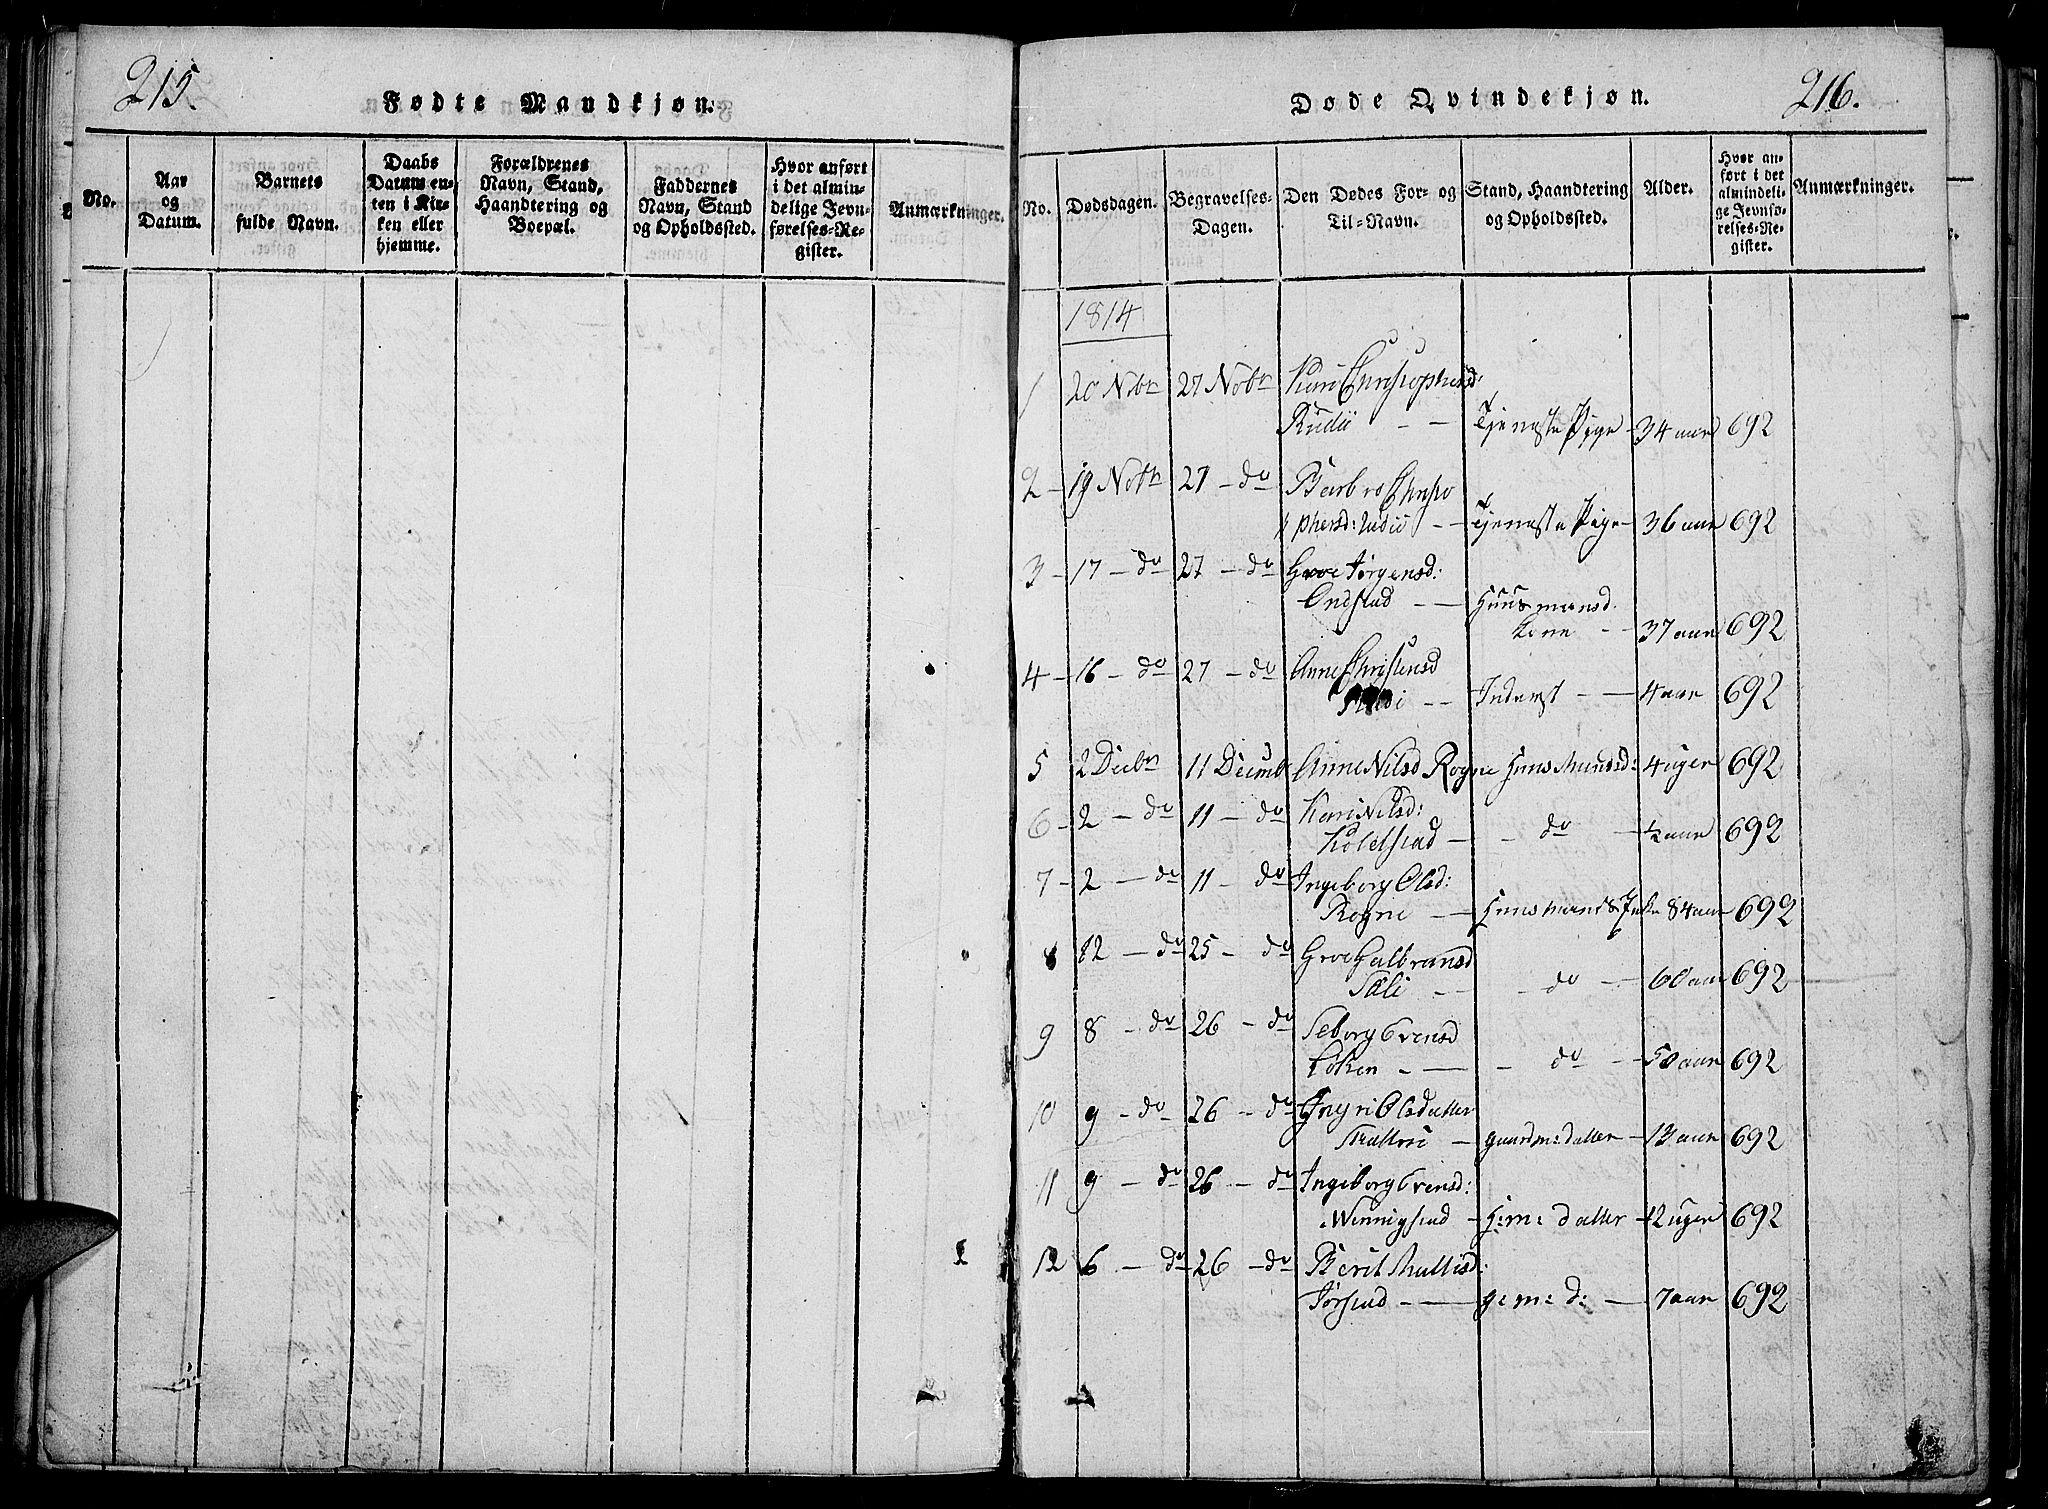 SAH, Slidre prestekontor, Klokkerbok nr. 2, 1814-1839, s. 215-216